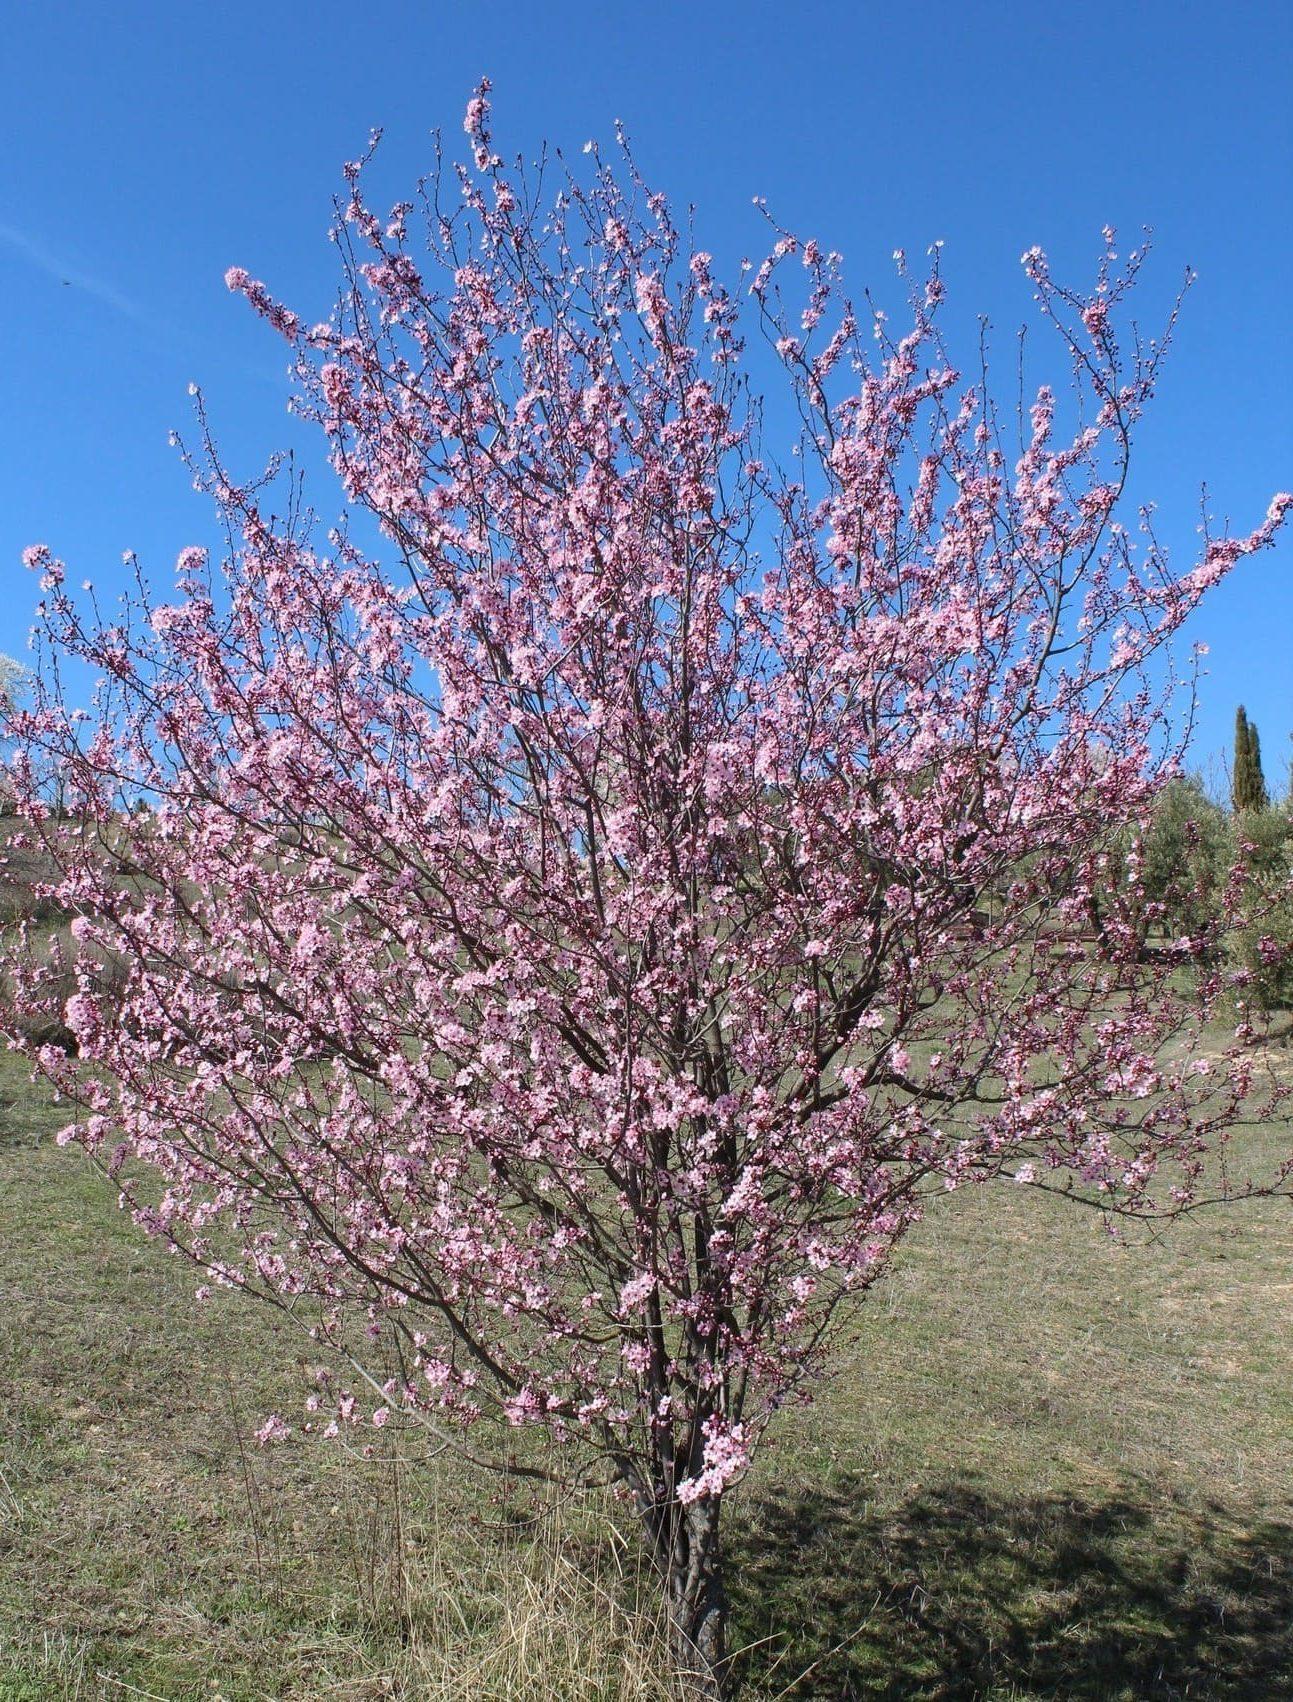 árboles: prunus